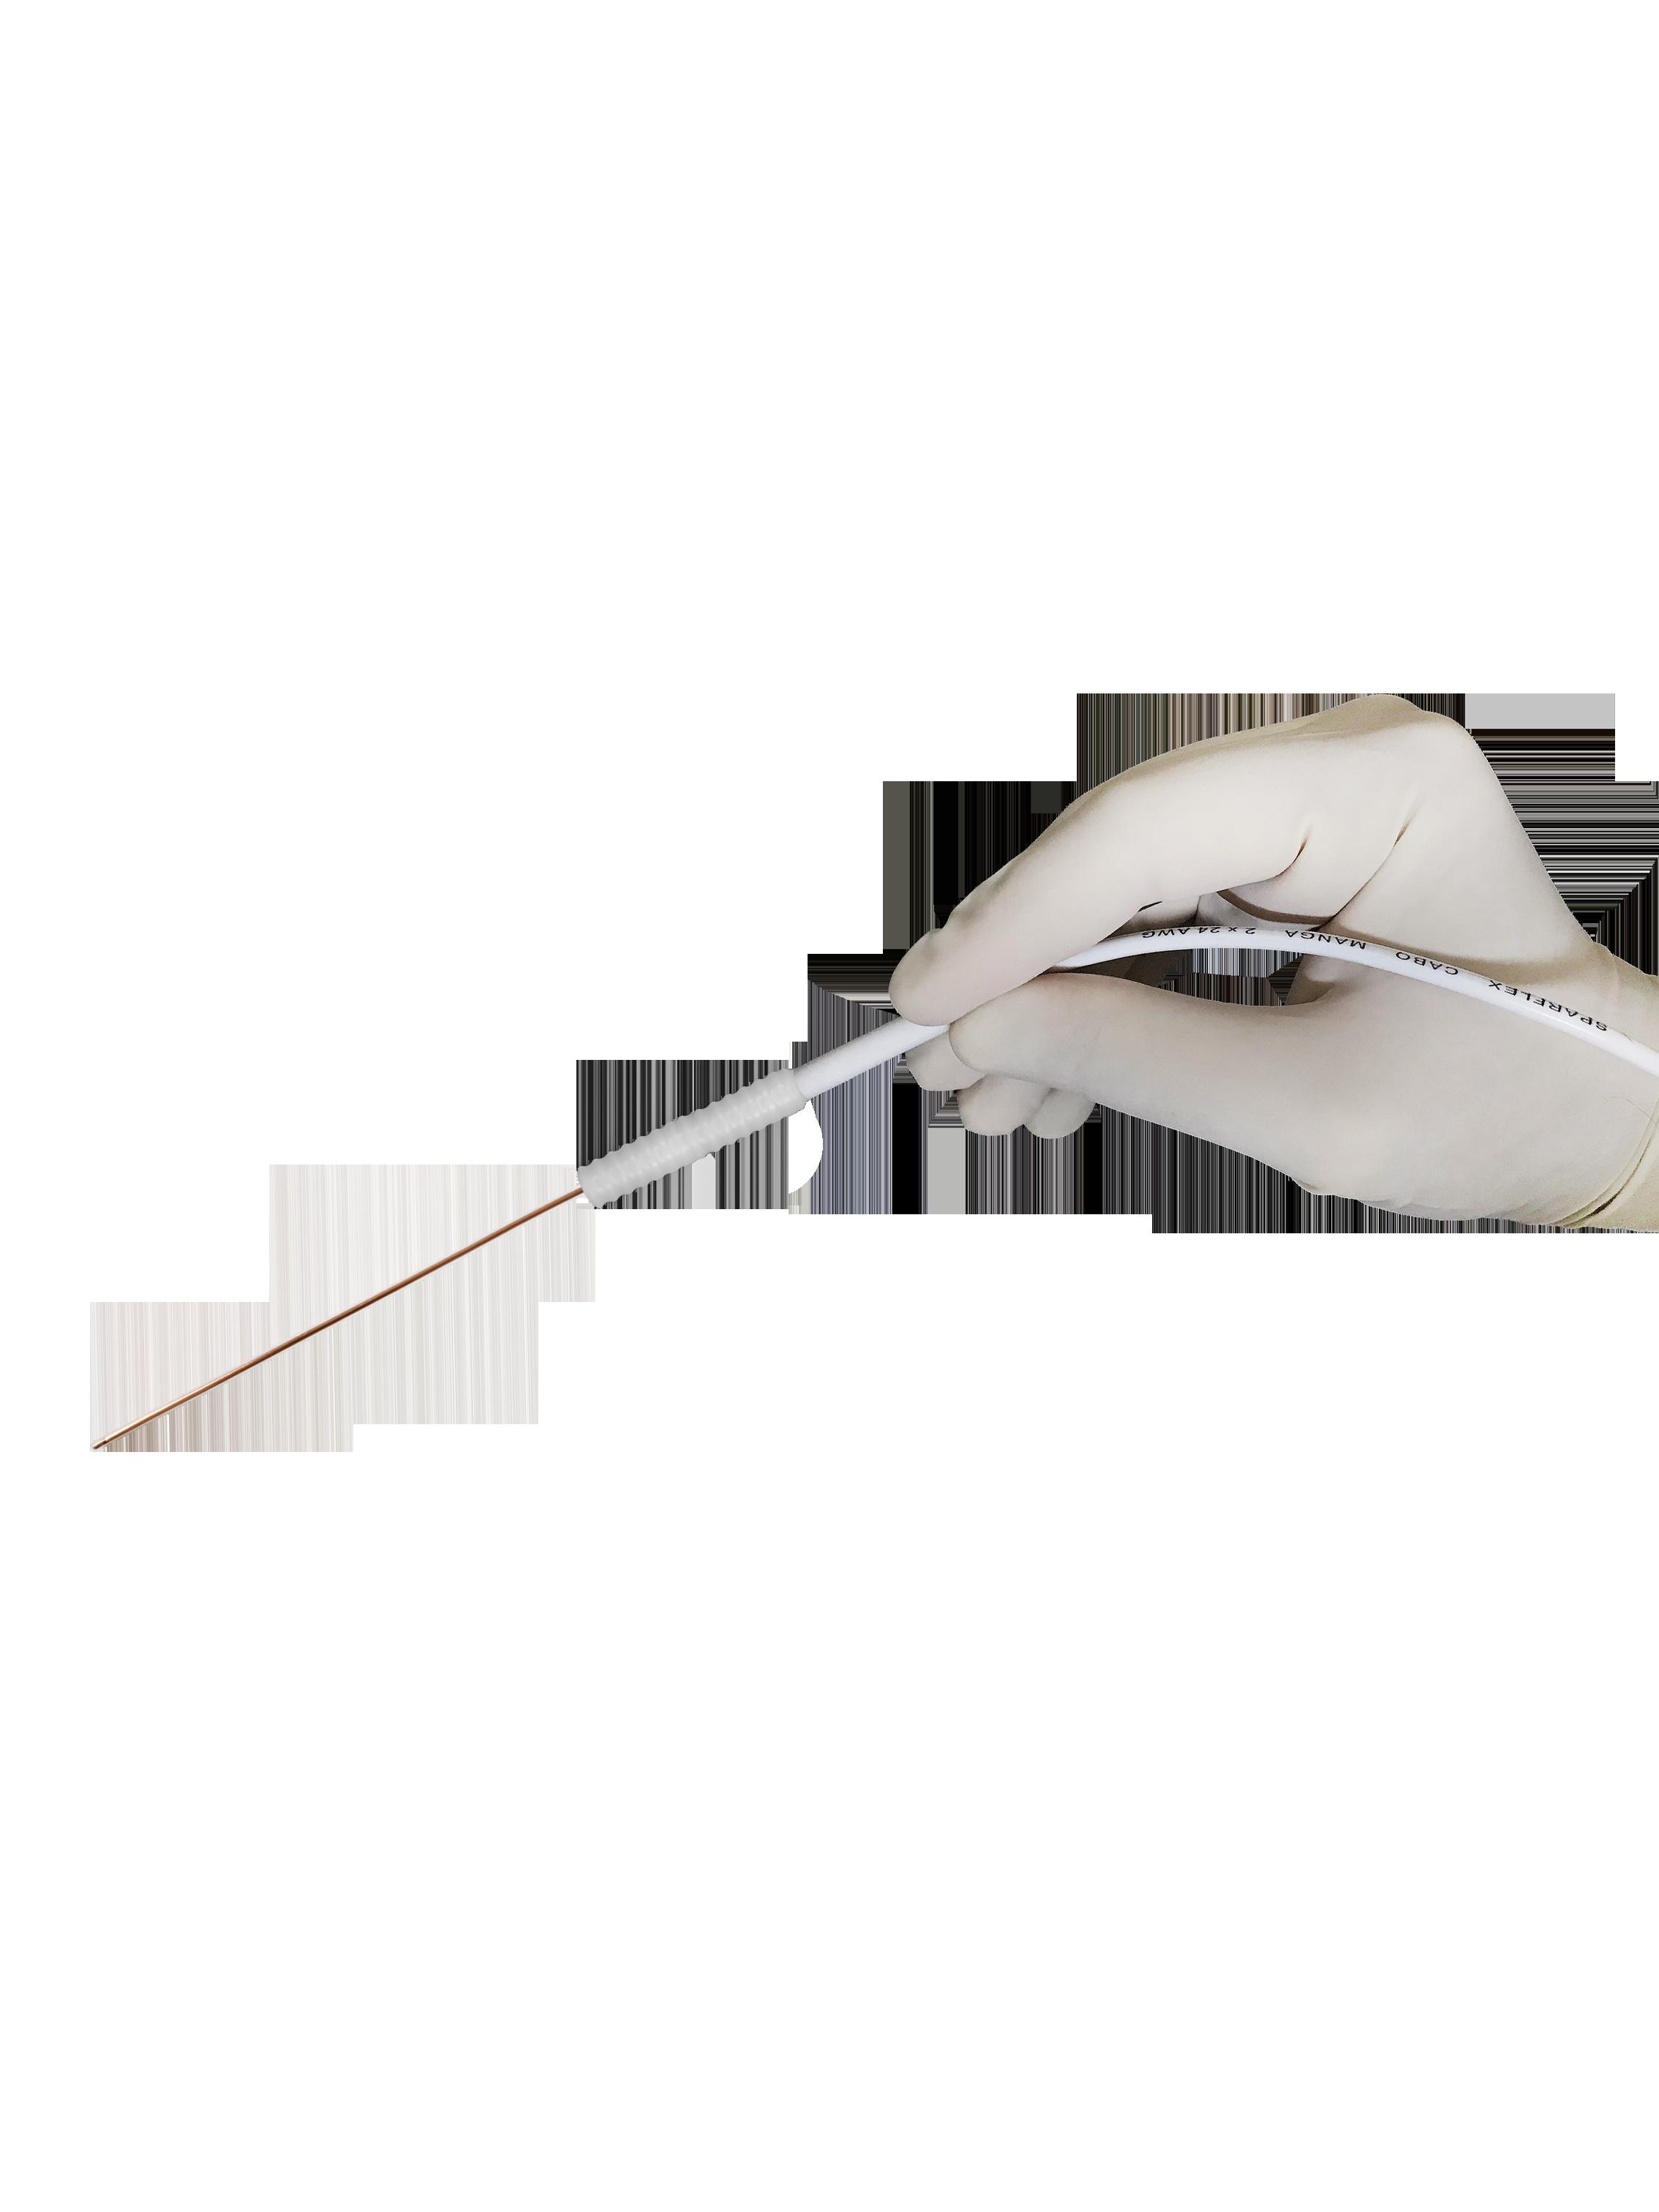 ACEL1508 - Eletrodo Eletrocirúgico Dacrio, Reto